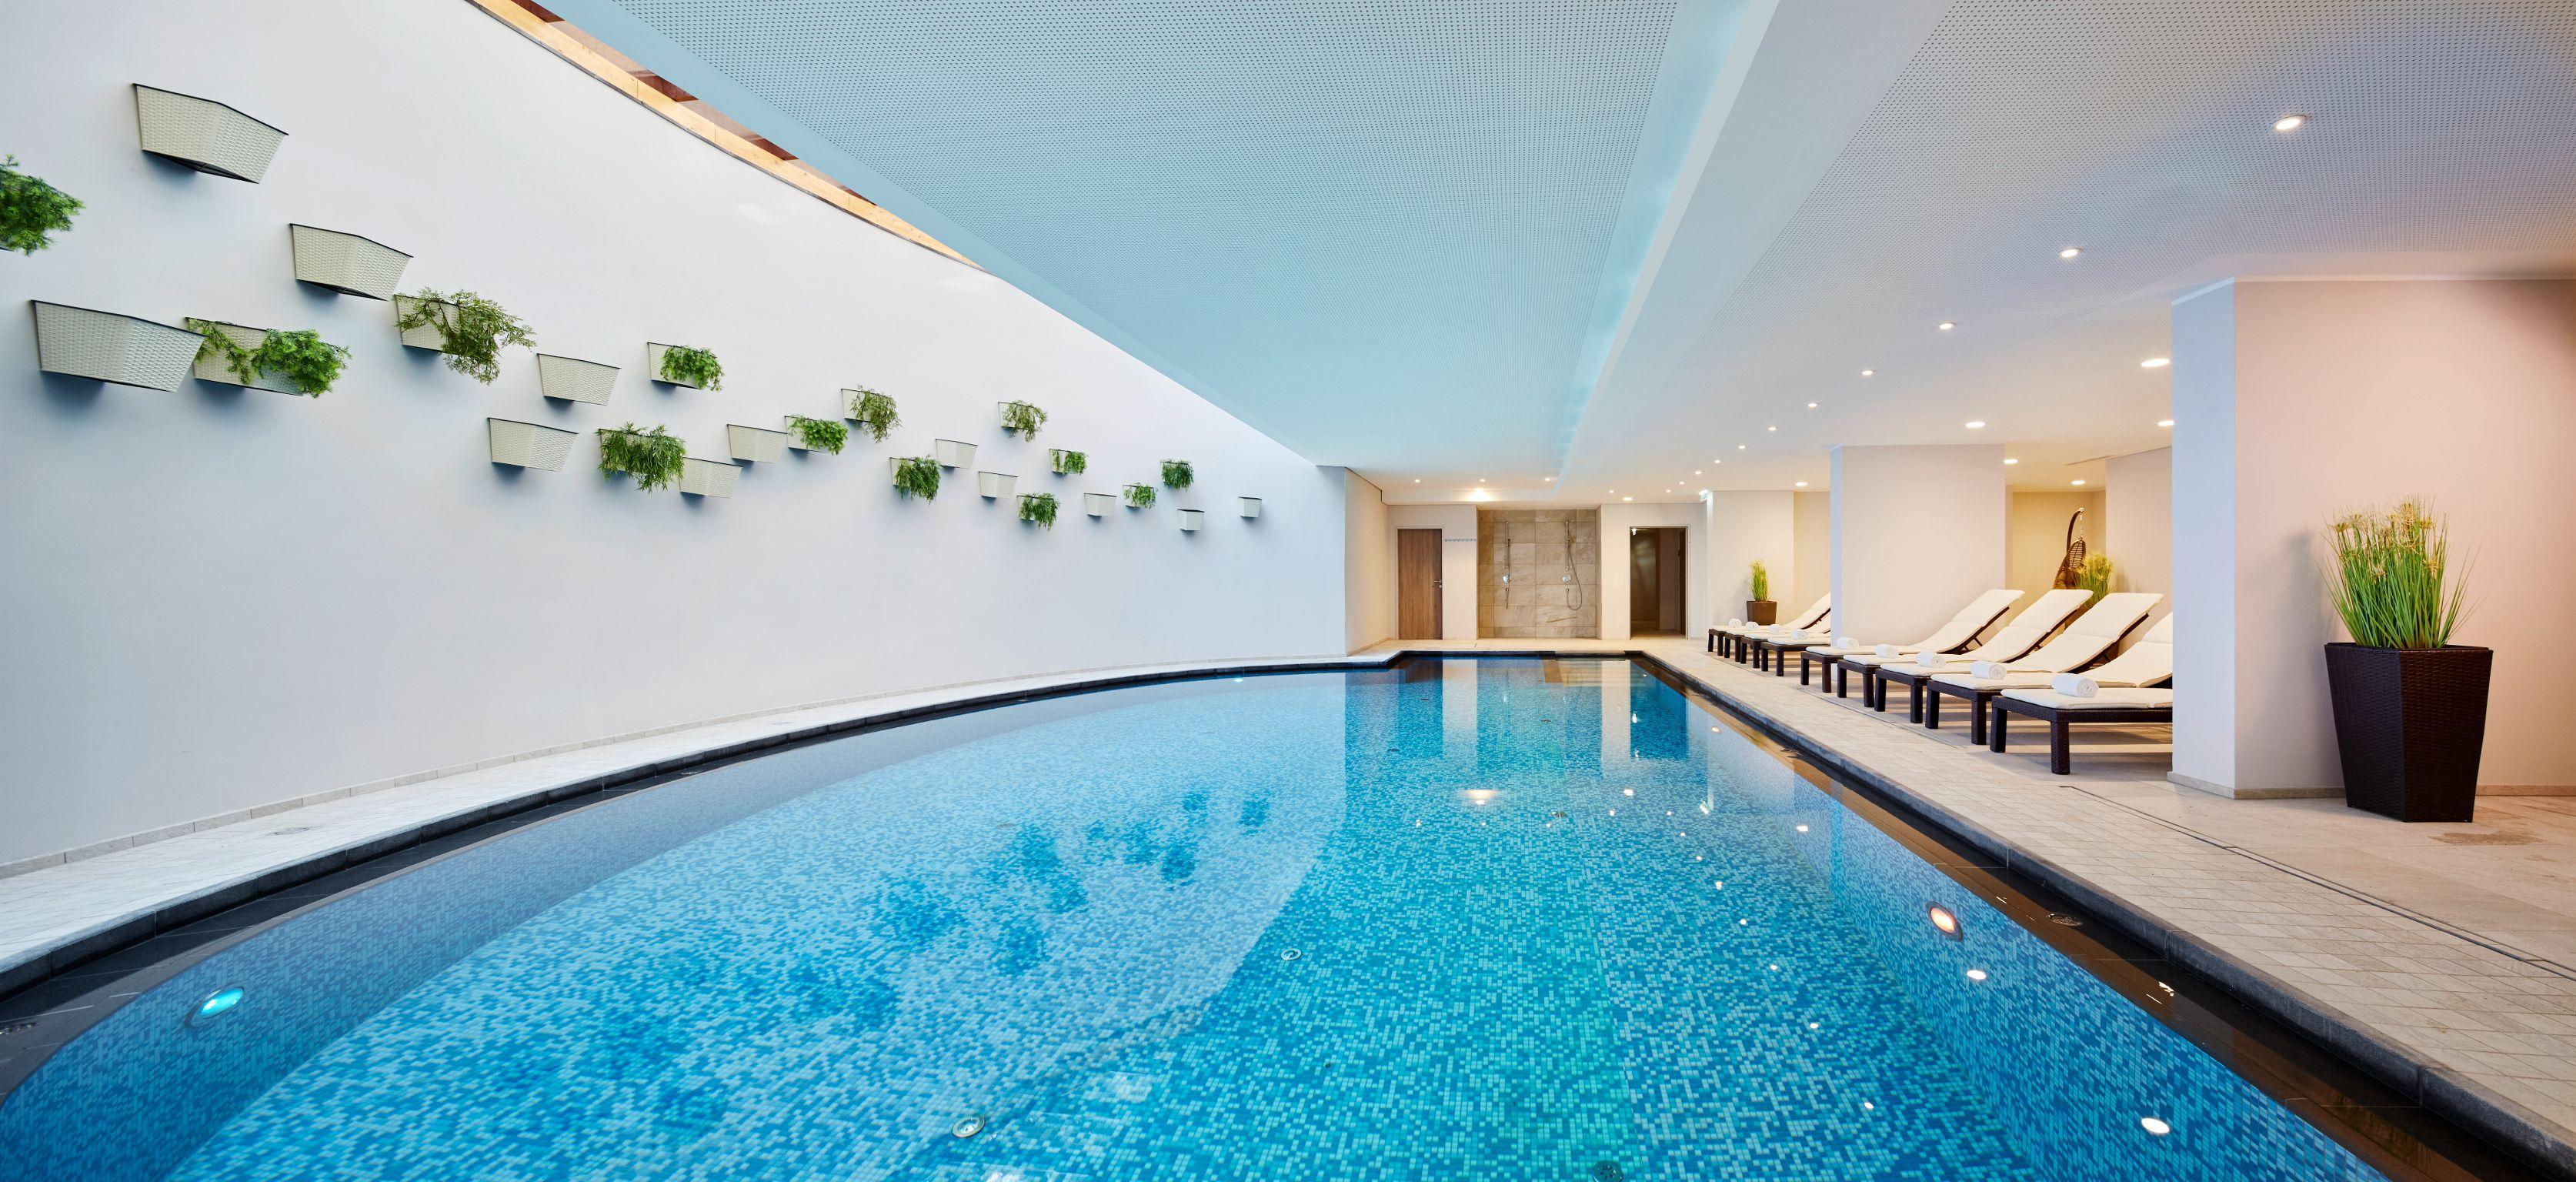 20 tolle swimmingpool designs in geometrischen formen | menerima, Gartengerate ideen